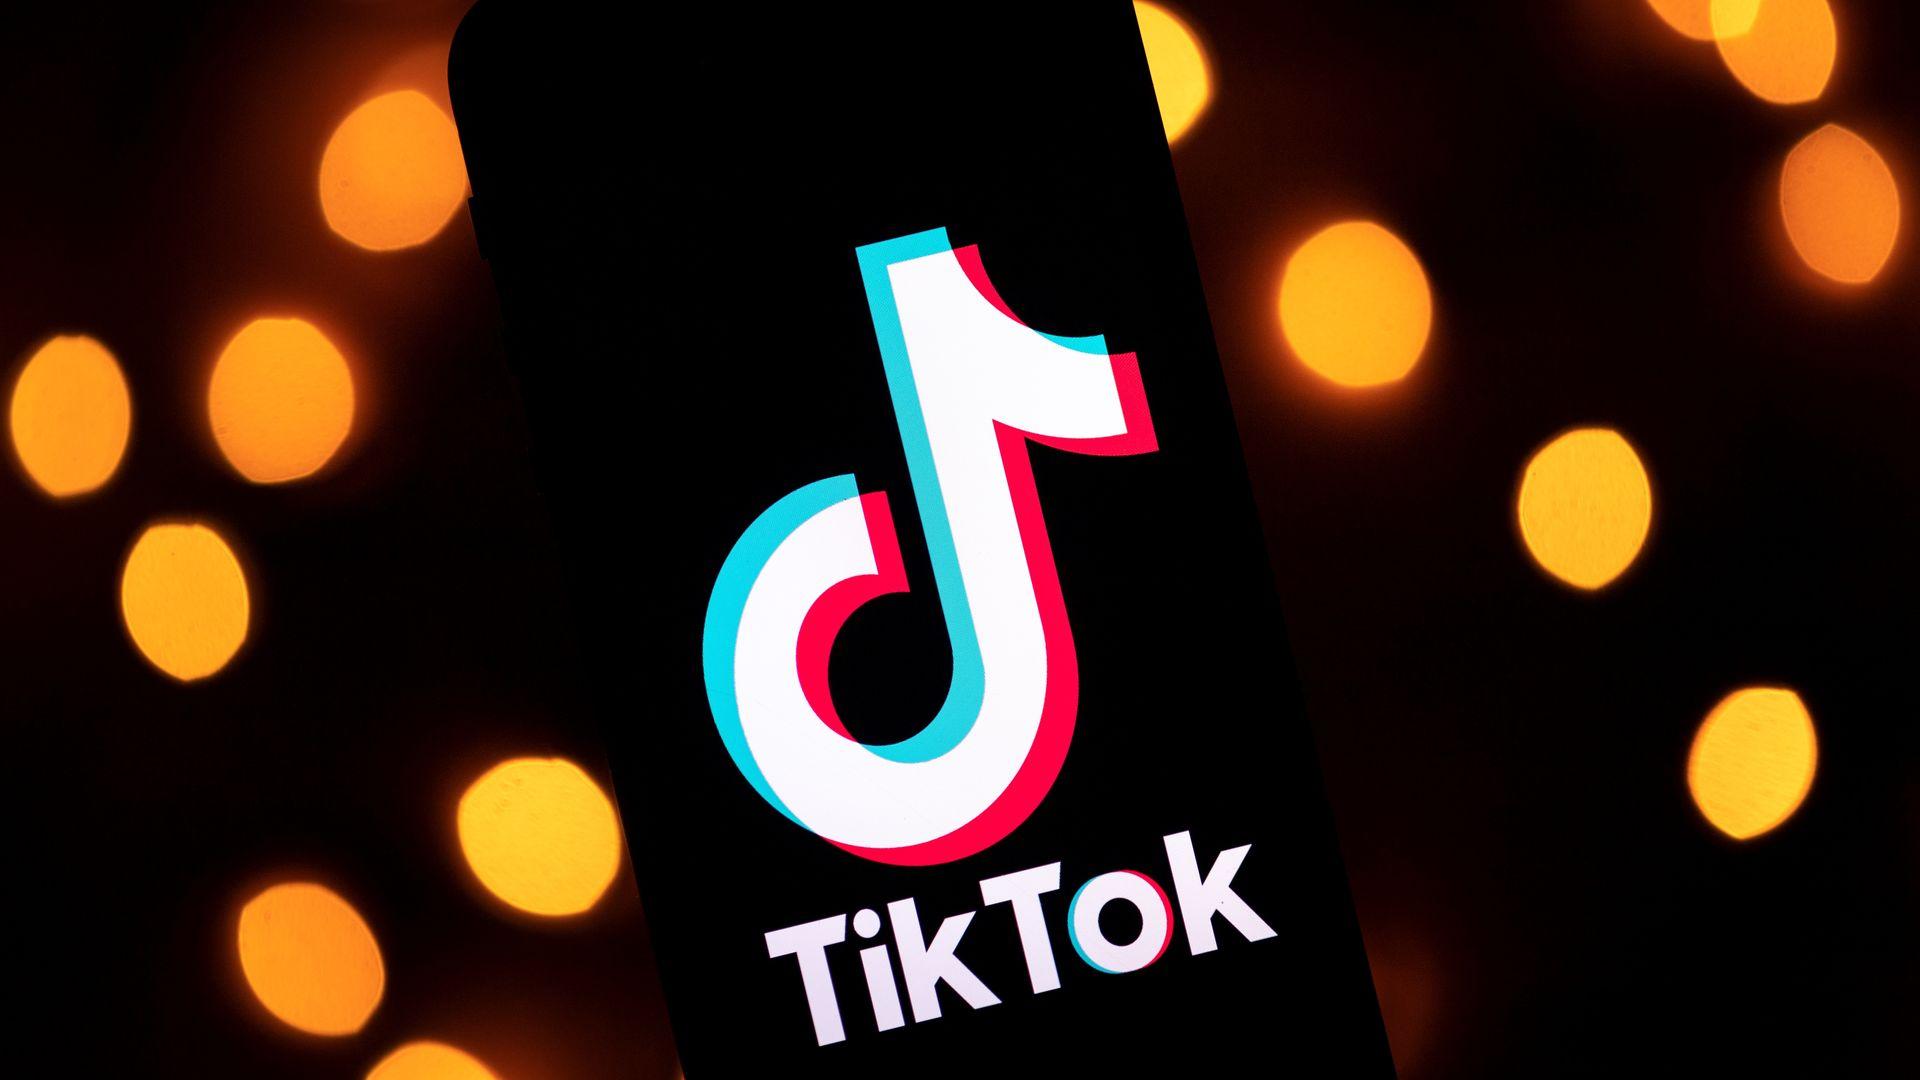 A photo of TikTok's logo.